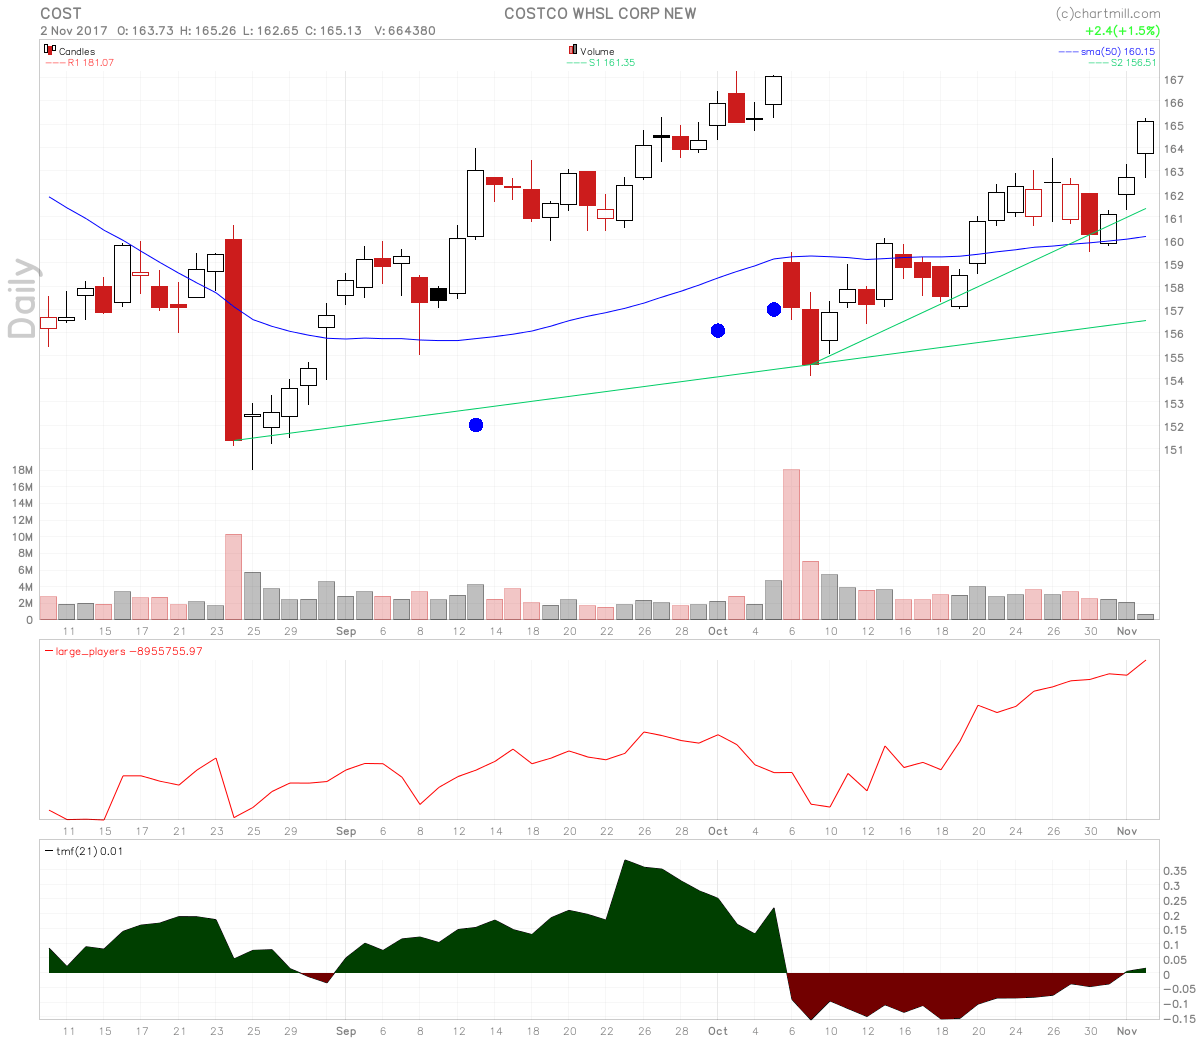 Costco stock chart making strong bullish move higher.